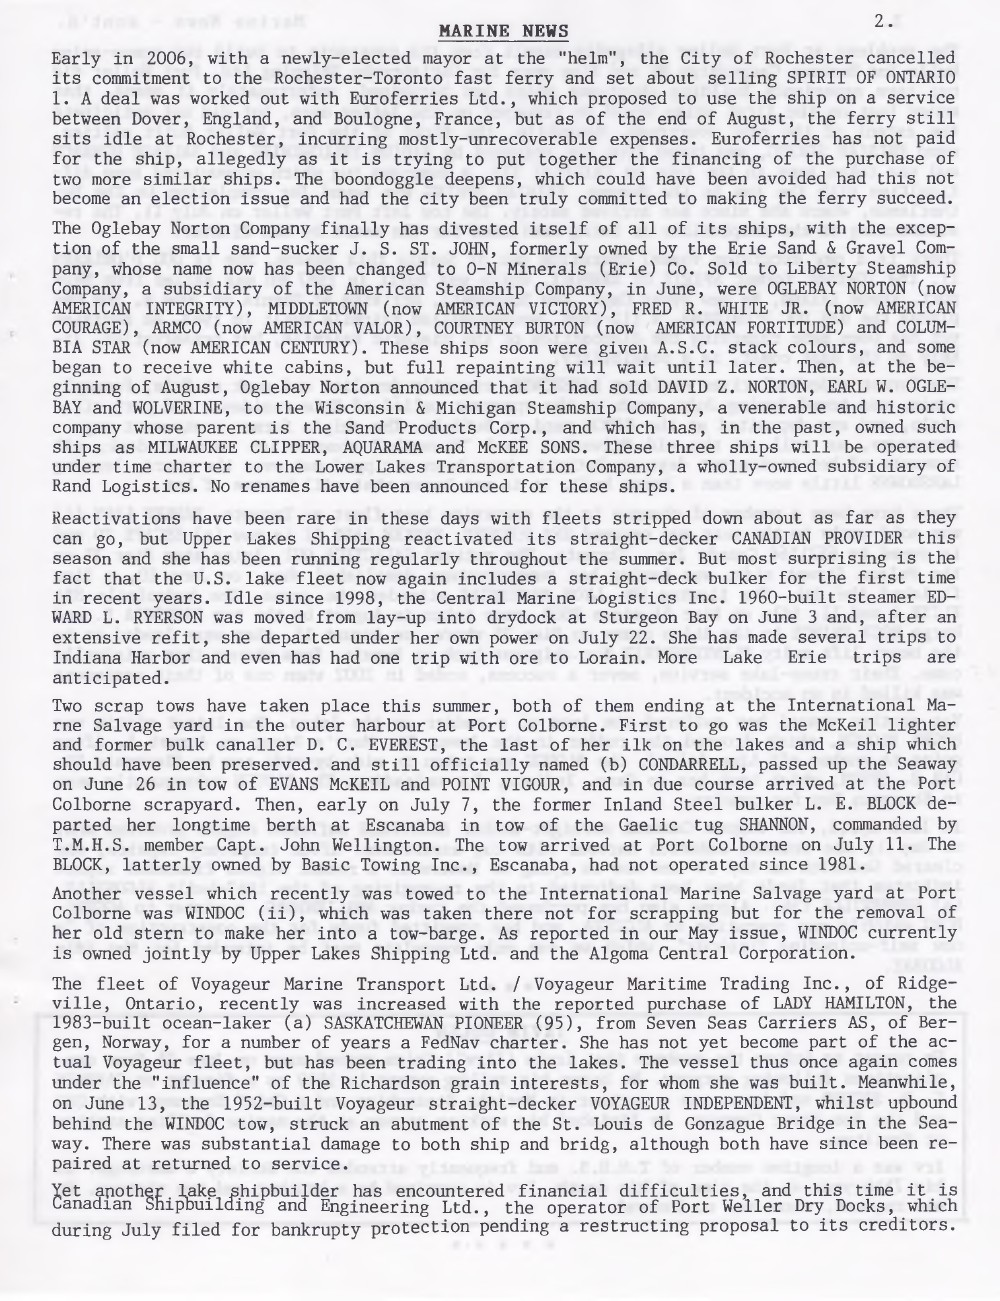 Scanner, v. 38, no. 8 (Mid_Summer 2006)